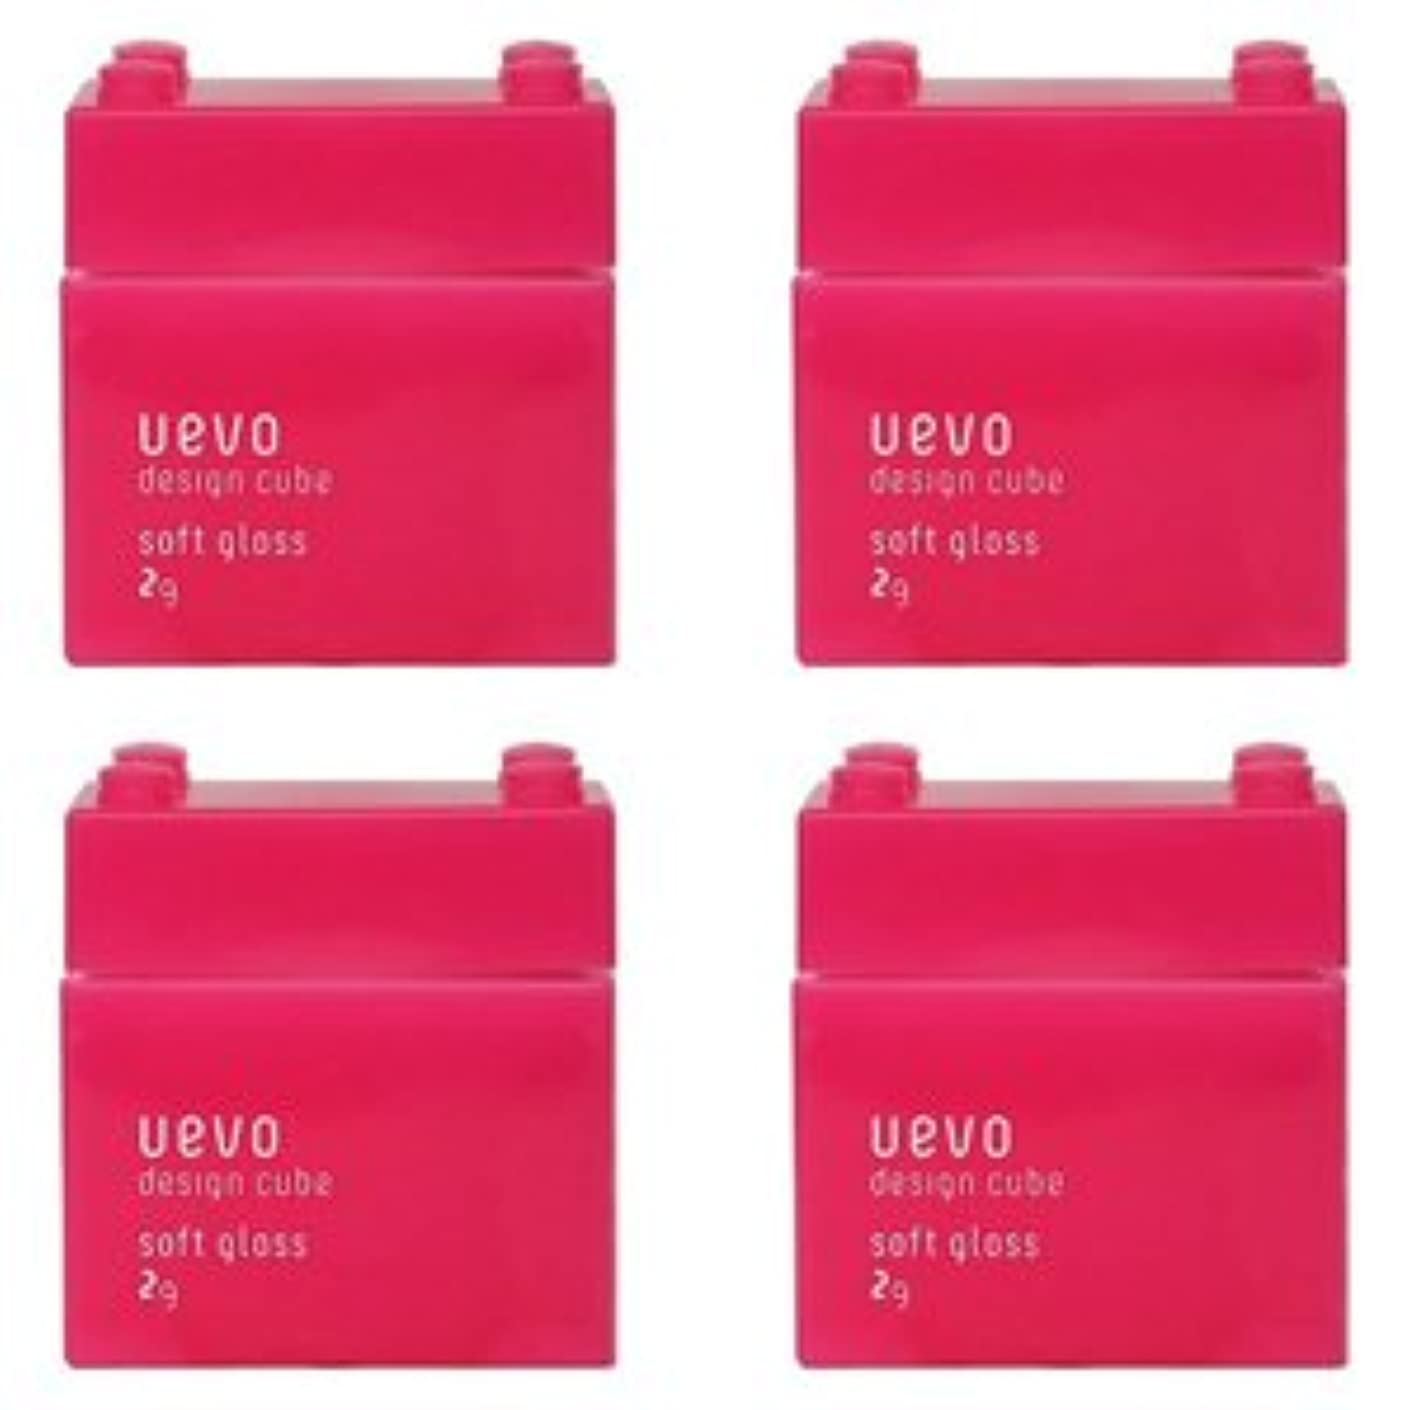 【X4個セット】 デミ ウェーボ デザインキューブ ソフトグロス 80g soft gloss DEMI uevo design cube